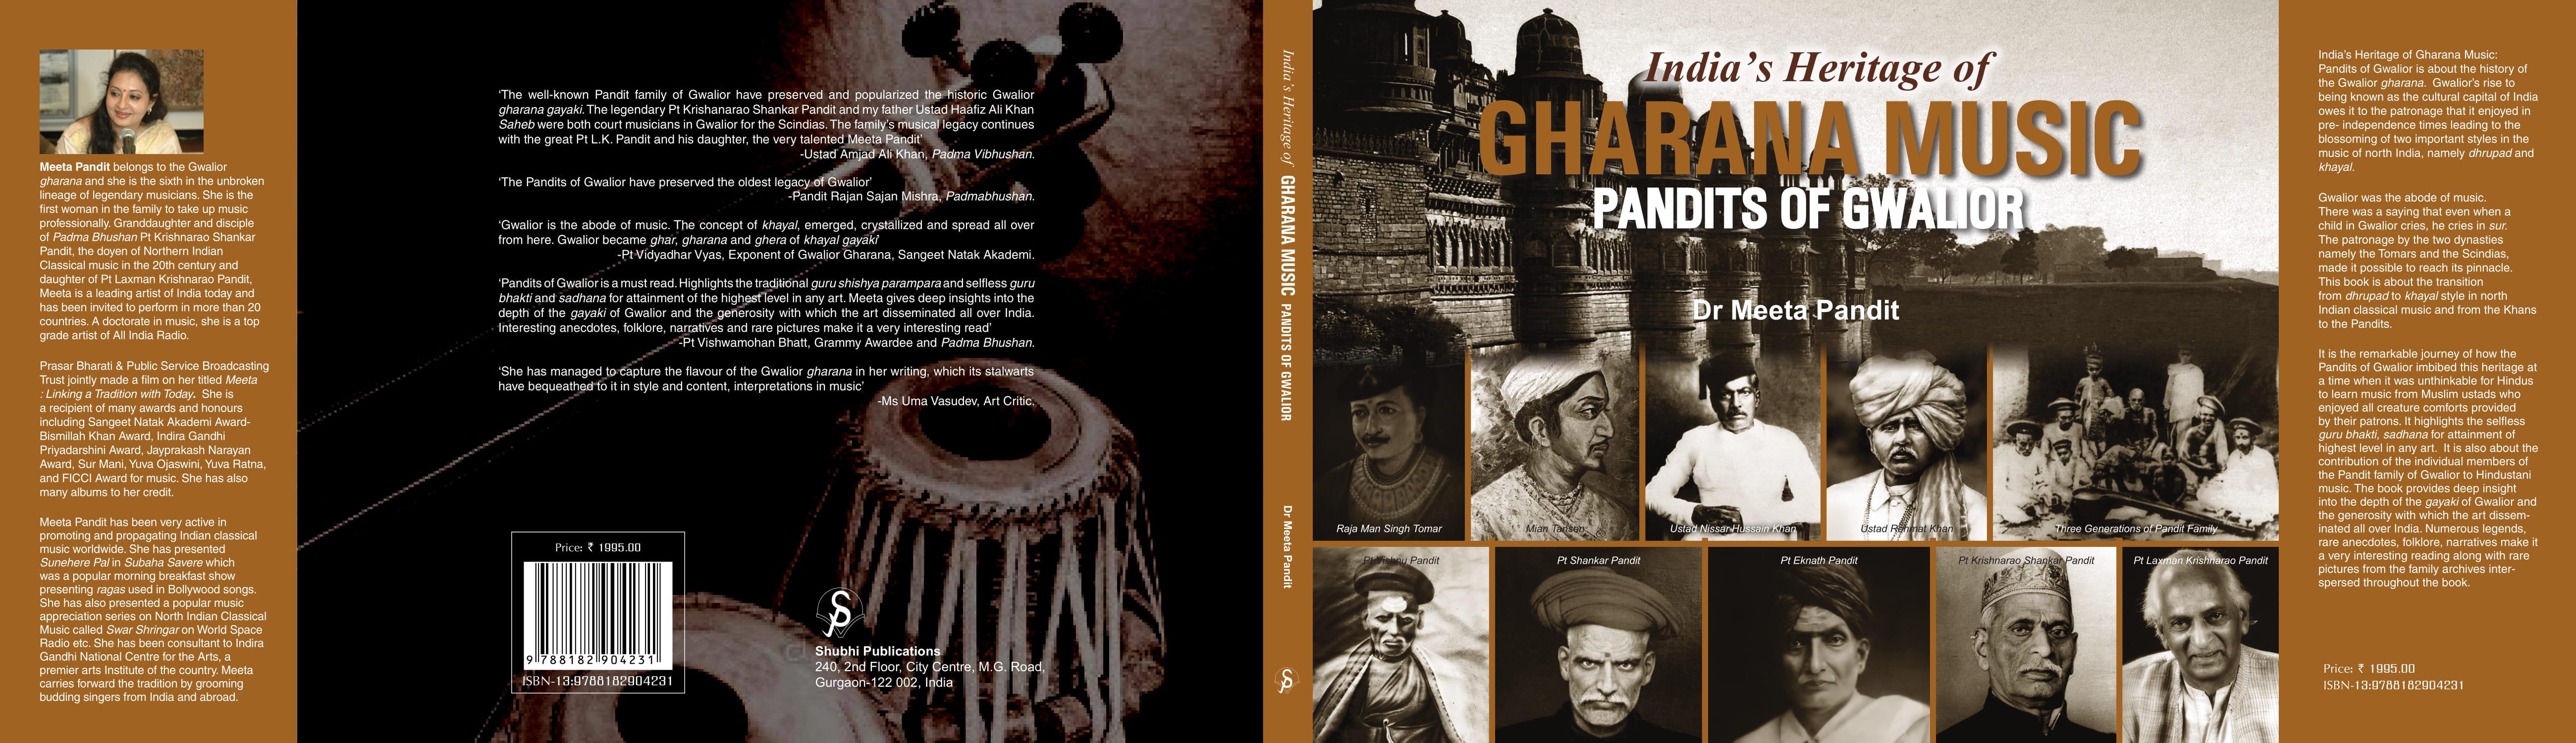 india's heritage of gharana music